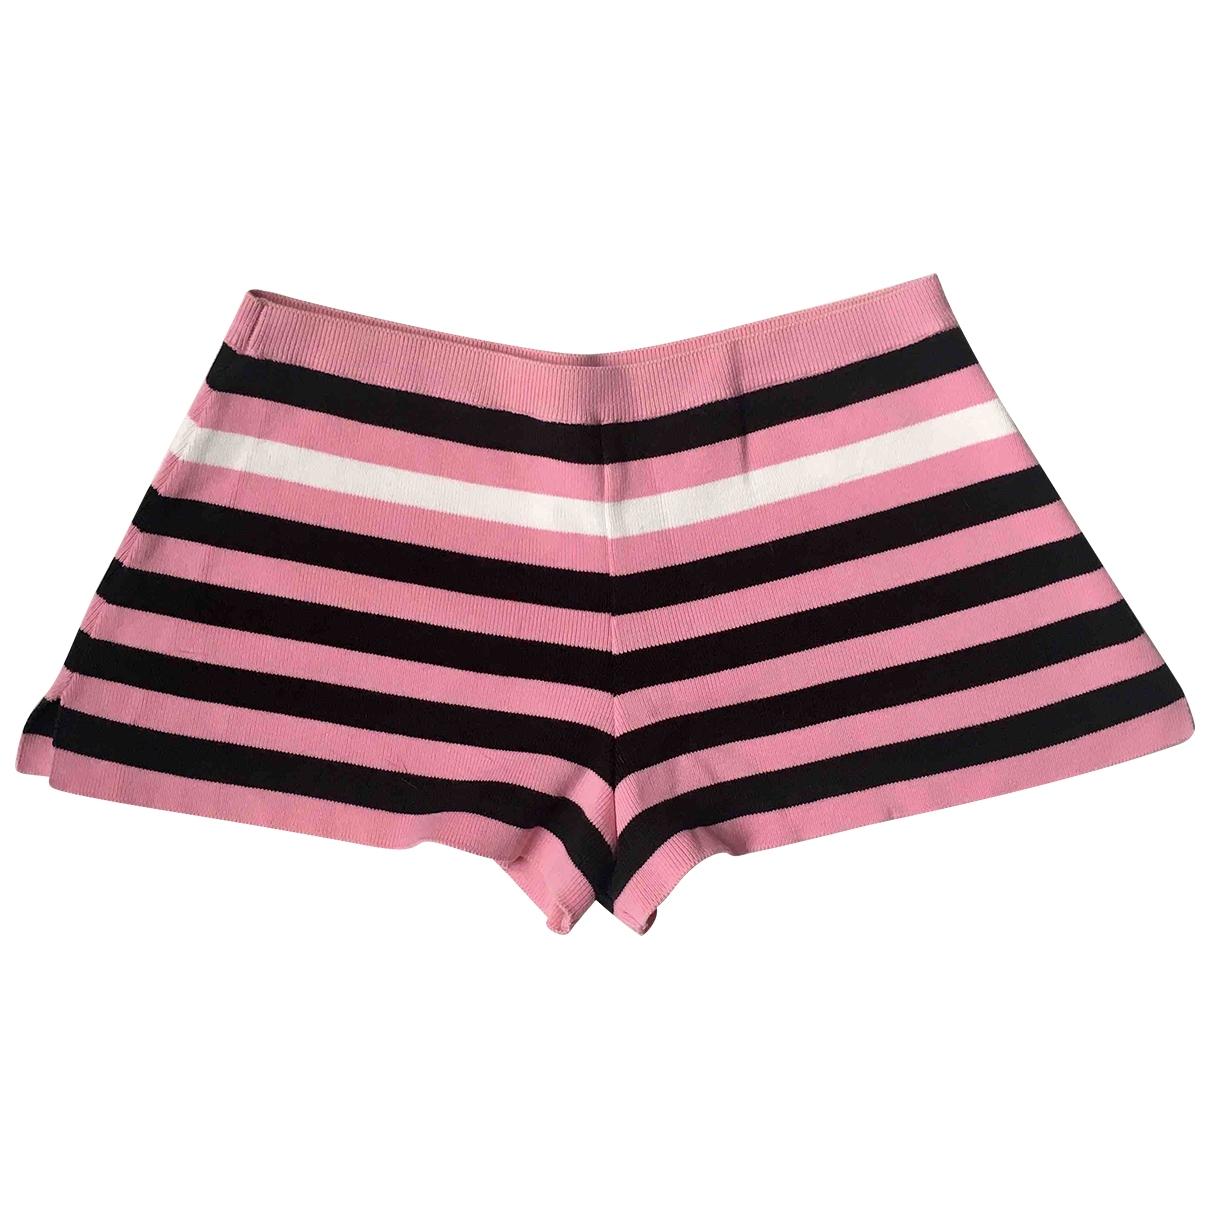 Sonia By Sonia Rykiel \N Shorts in  Rosa Baumwolle